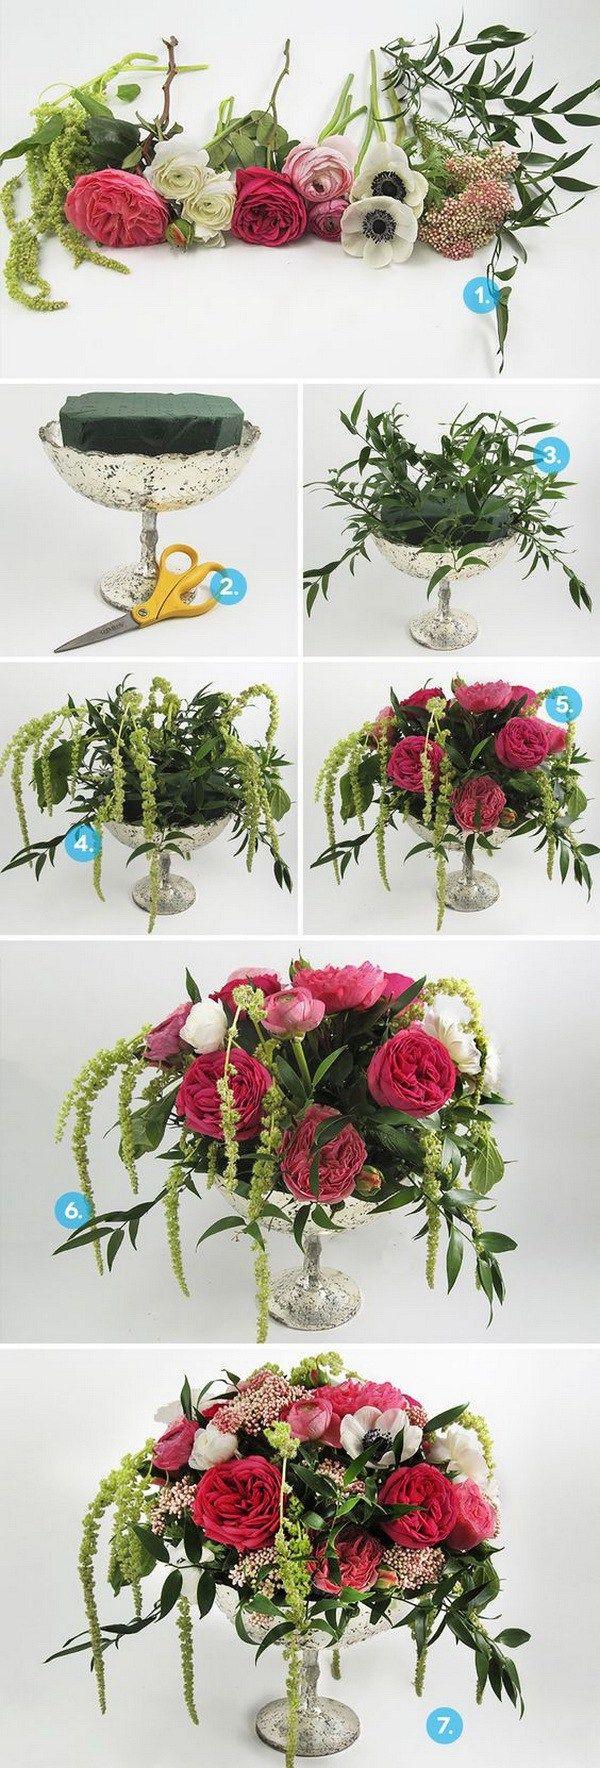 DIY Anemone Wedding Centerpiece. Perfectly delightful anemone centerpiece for…